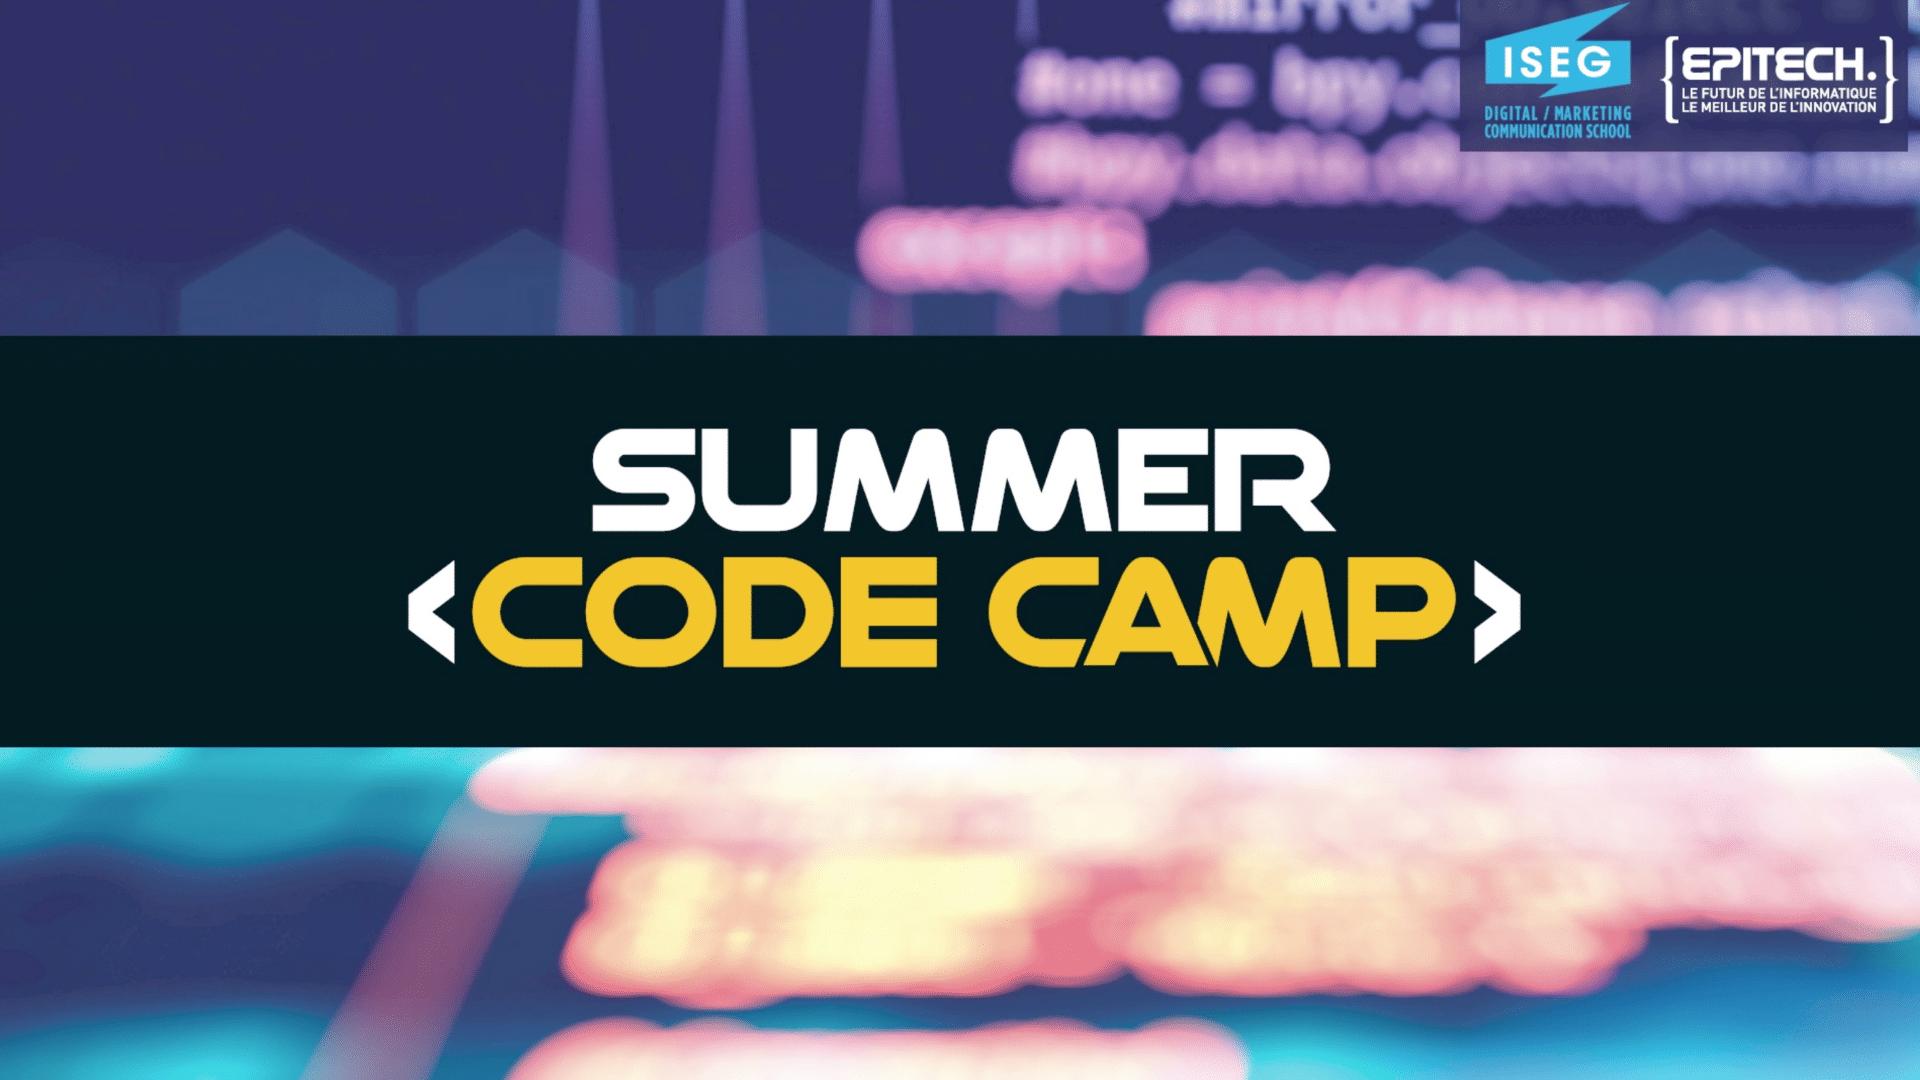 Summer Code Camp : initiation en mode remote avec Epitech